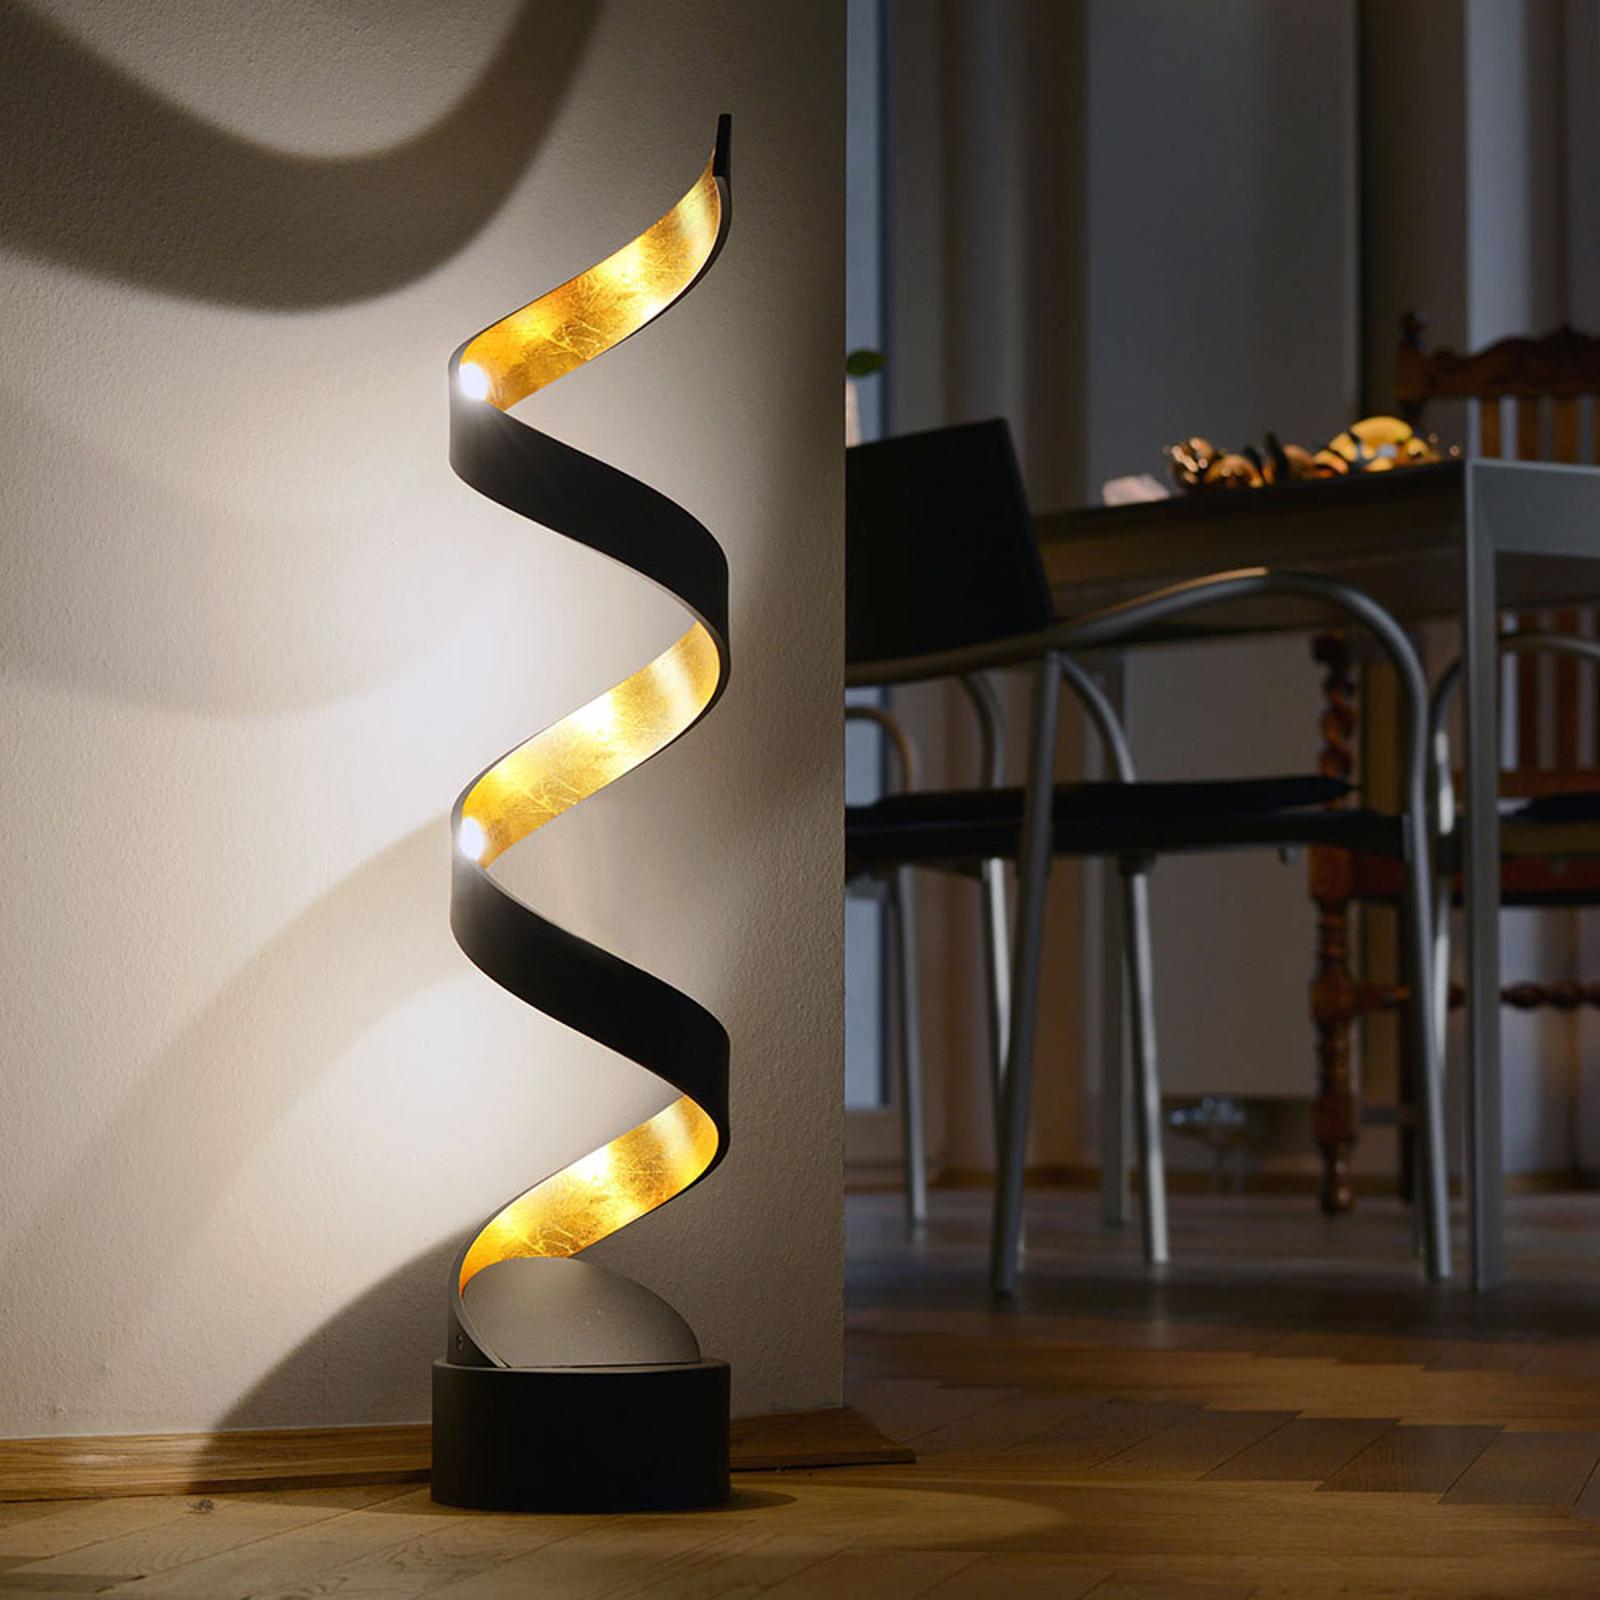 LED-bordslampa Helix, höjd 66 cm, svart-guld